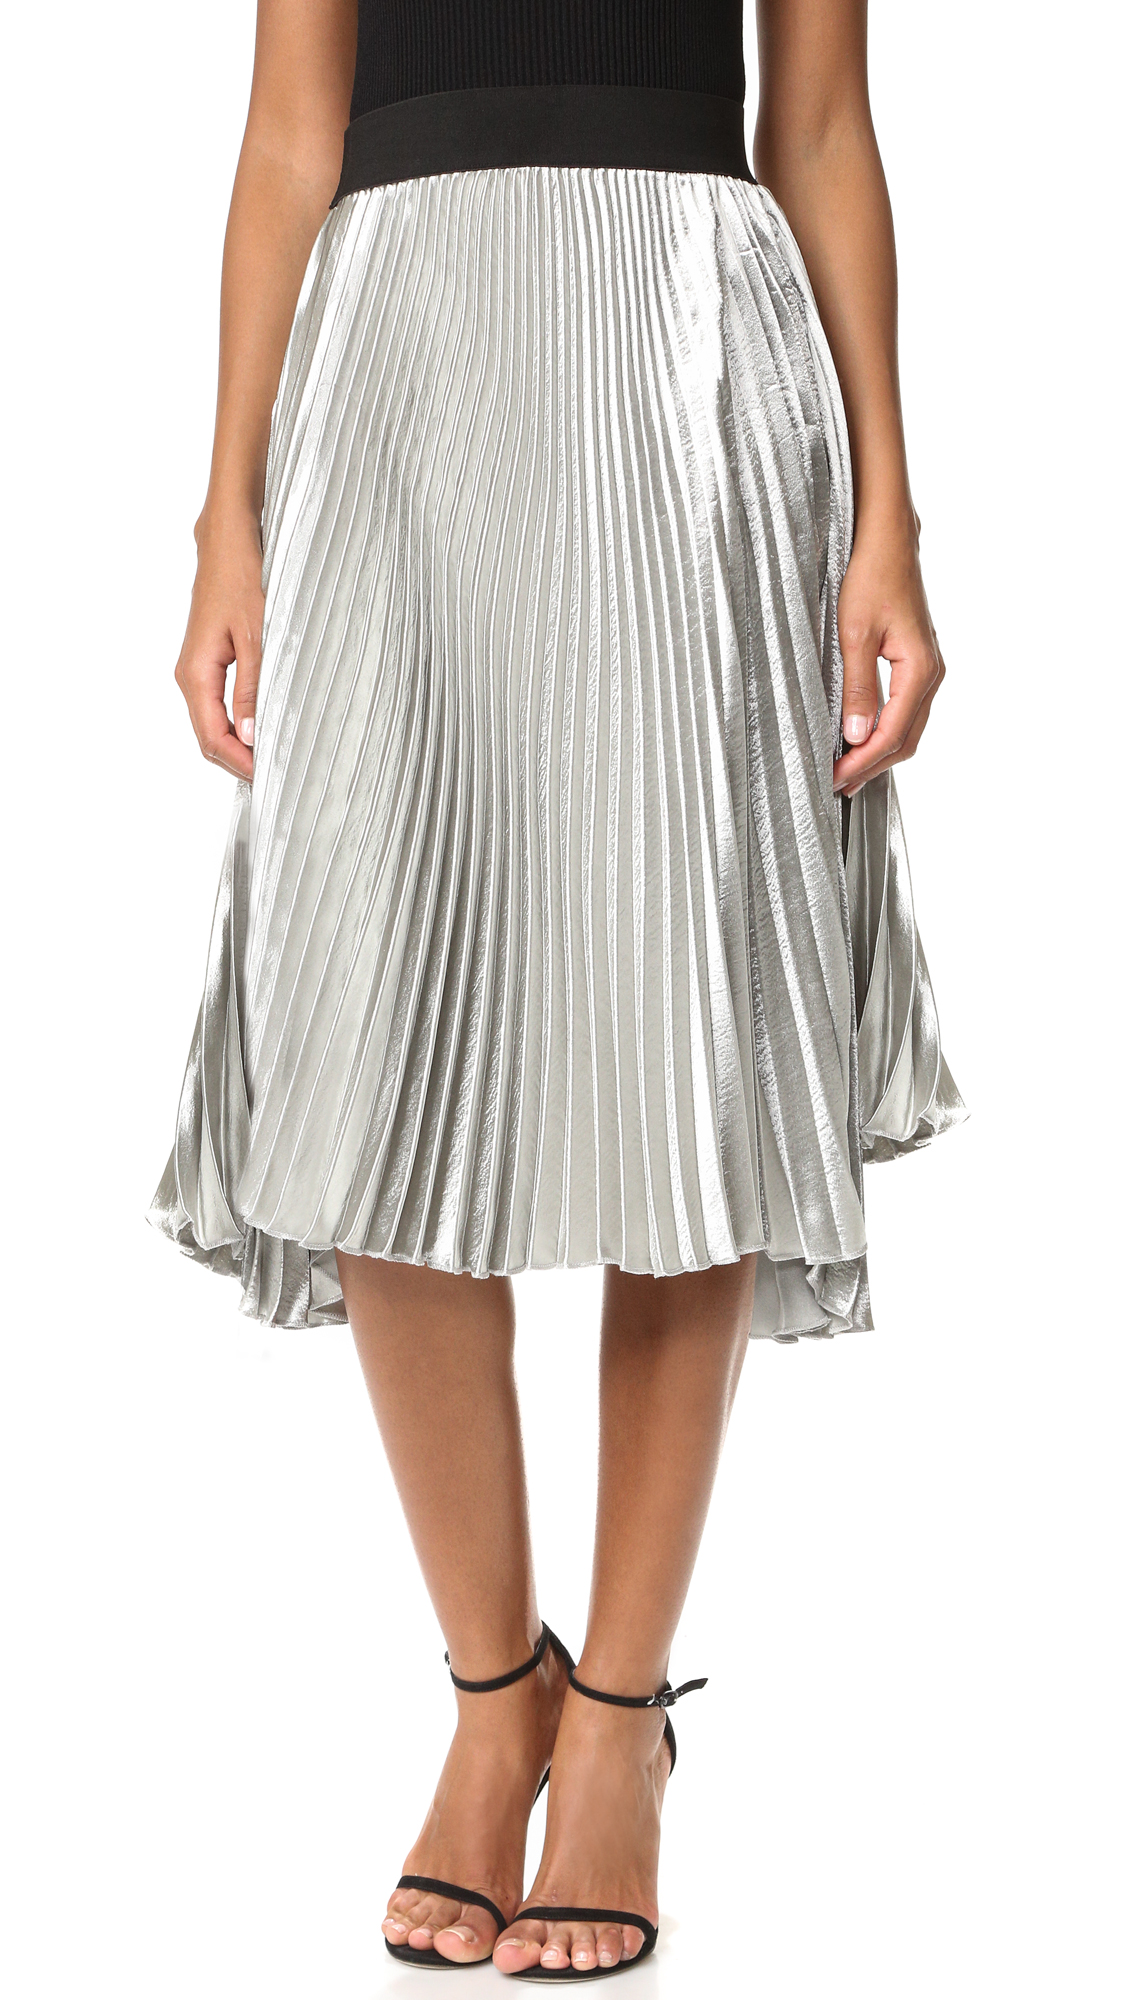 STYLEKEEPERS Retro Juliette Pleated Skirt - Metallic Silver